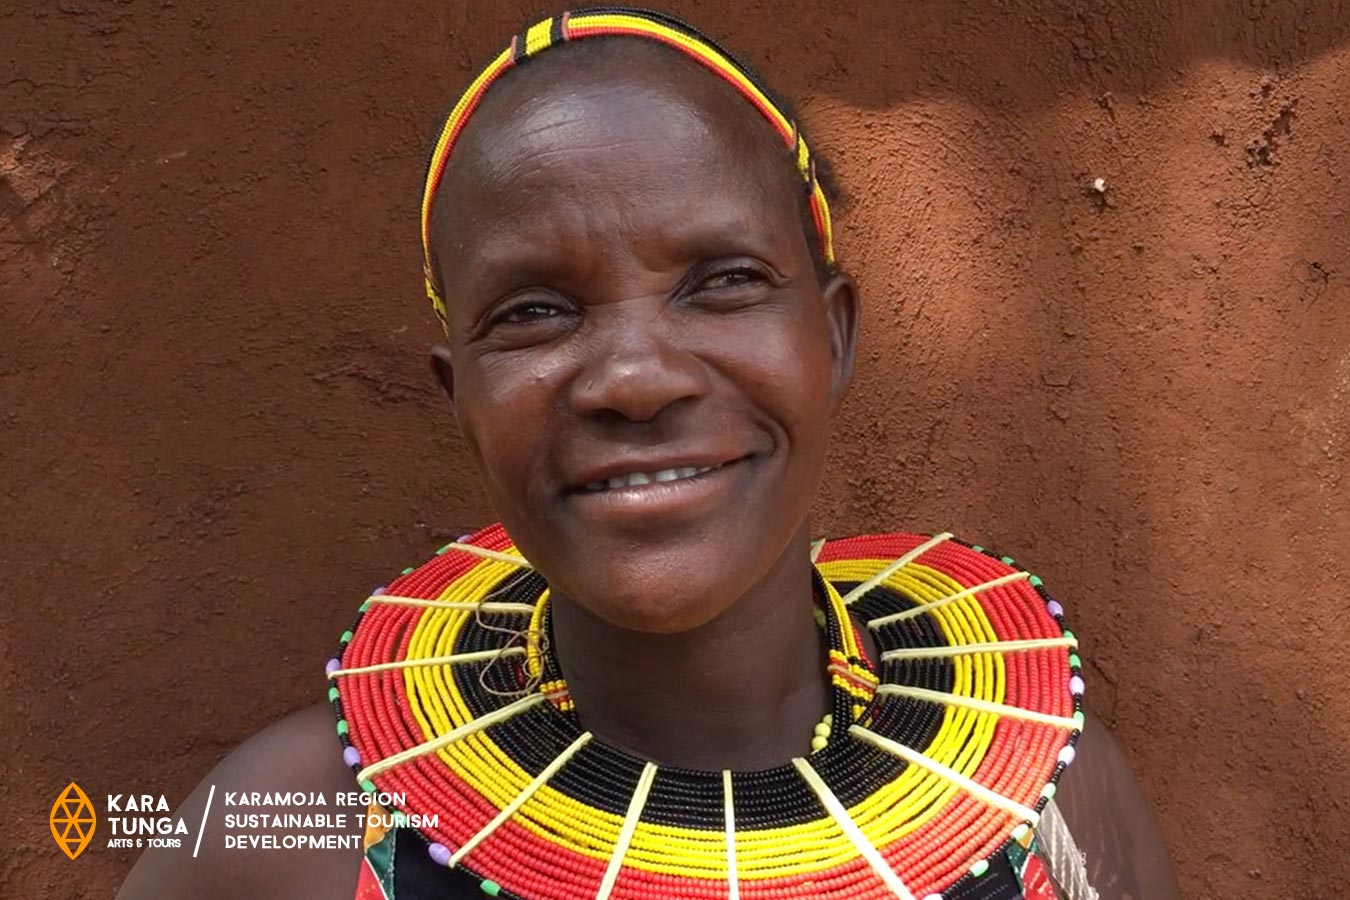 kara-tunga-impact-covid19-community-tourism-karamoja-uganda